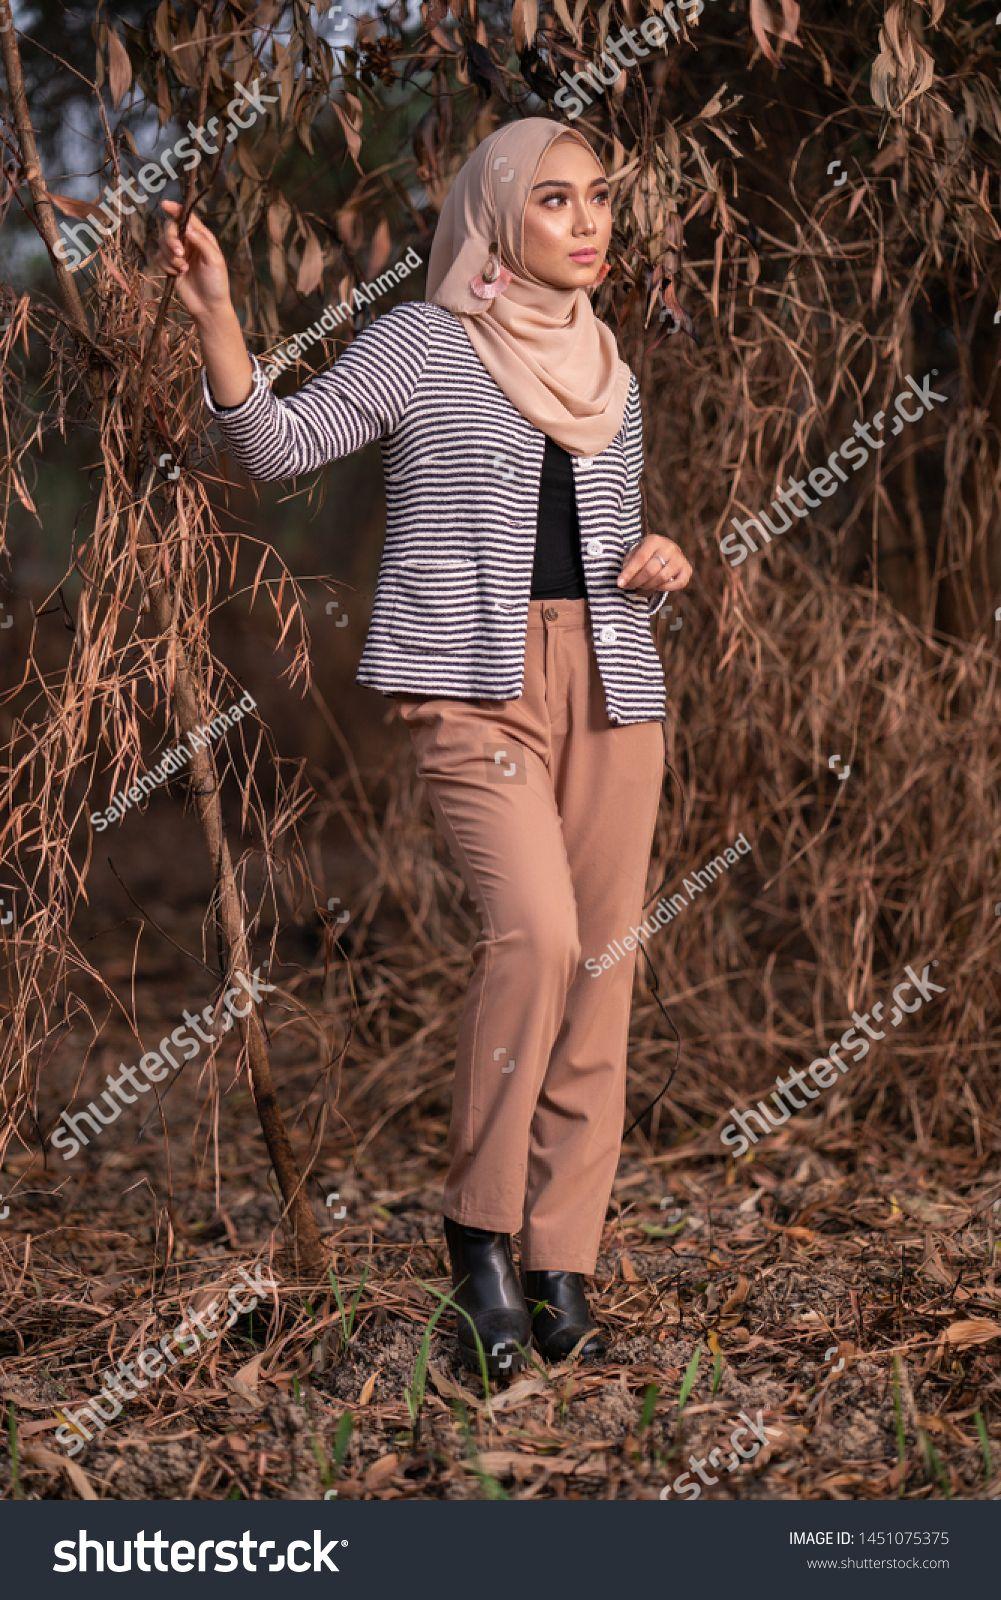 Beautiful Young Model In Fashionable Hijab Style Posing In Burnt Bush Area Stylish Muslim Female Hijab Fashion Lifesty In 2020 Fashion Fashion Lifestyle Hijab Fashion